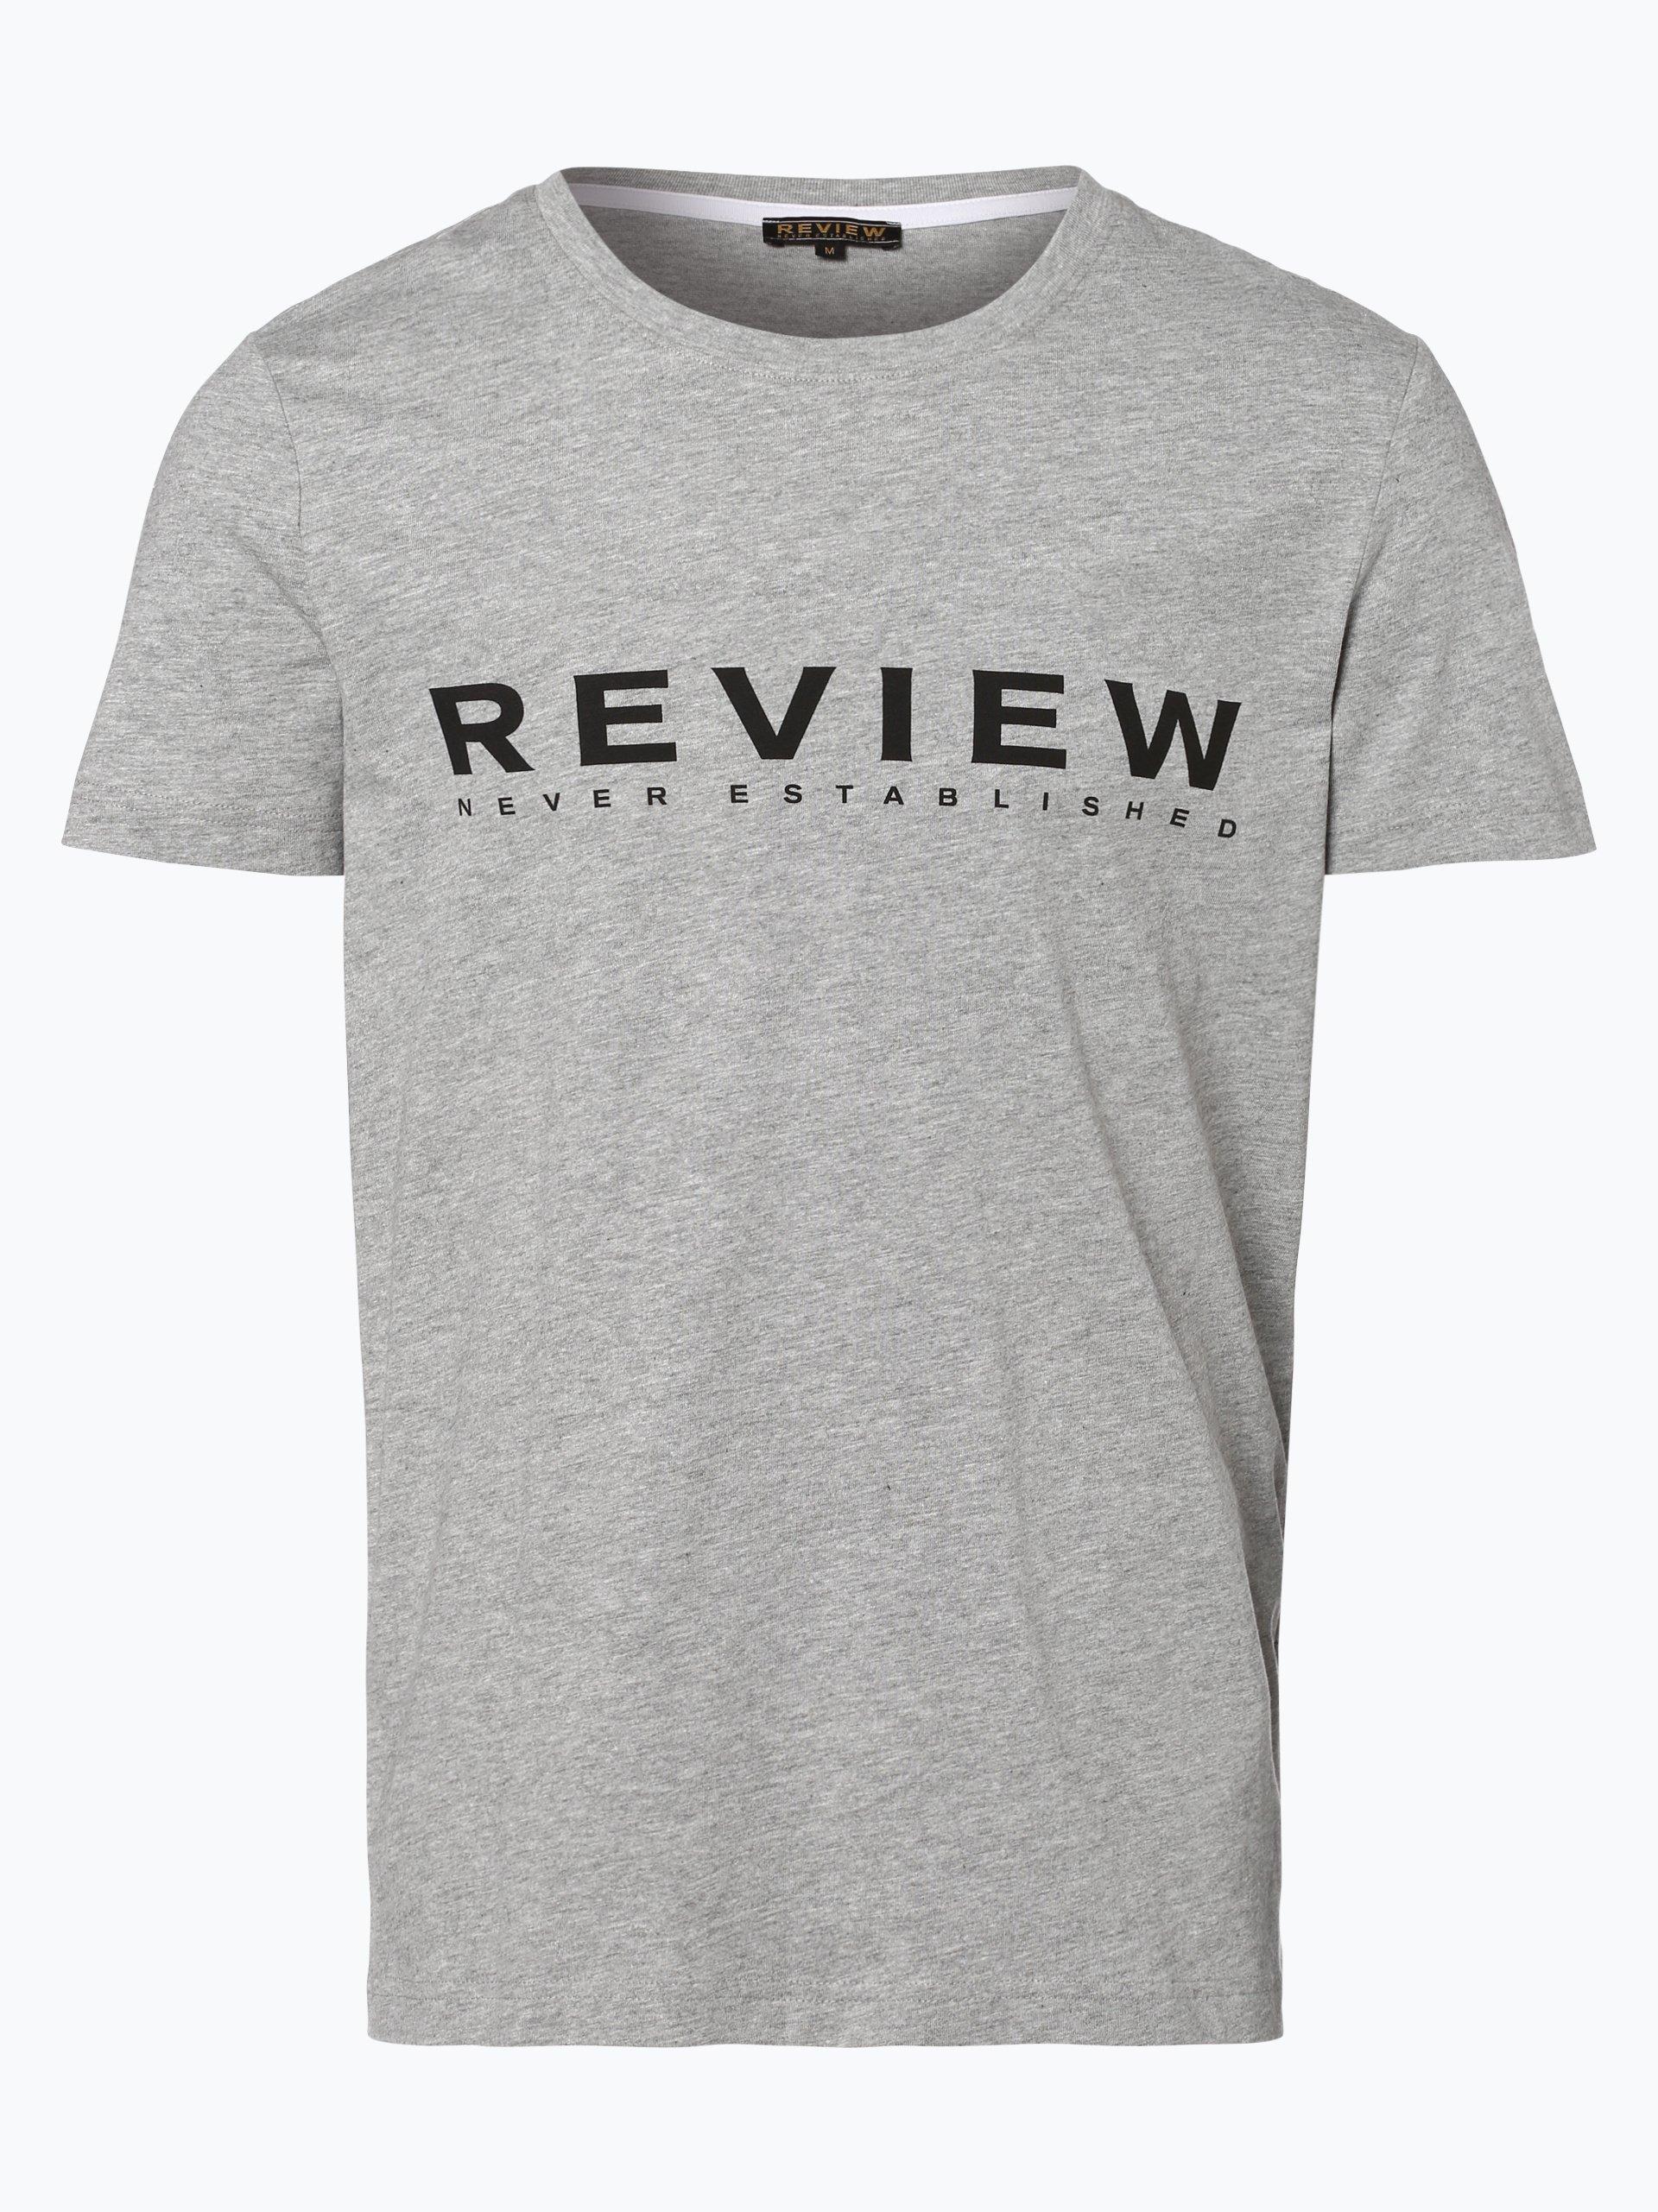 review herren t shirt grau gemustert online kaufen. Black Bedroom Furniture Sets. Home Design Ideas